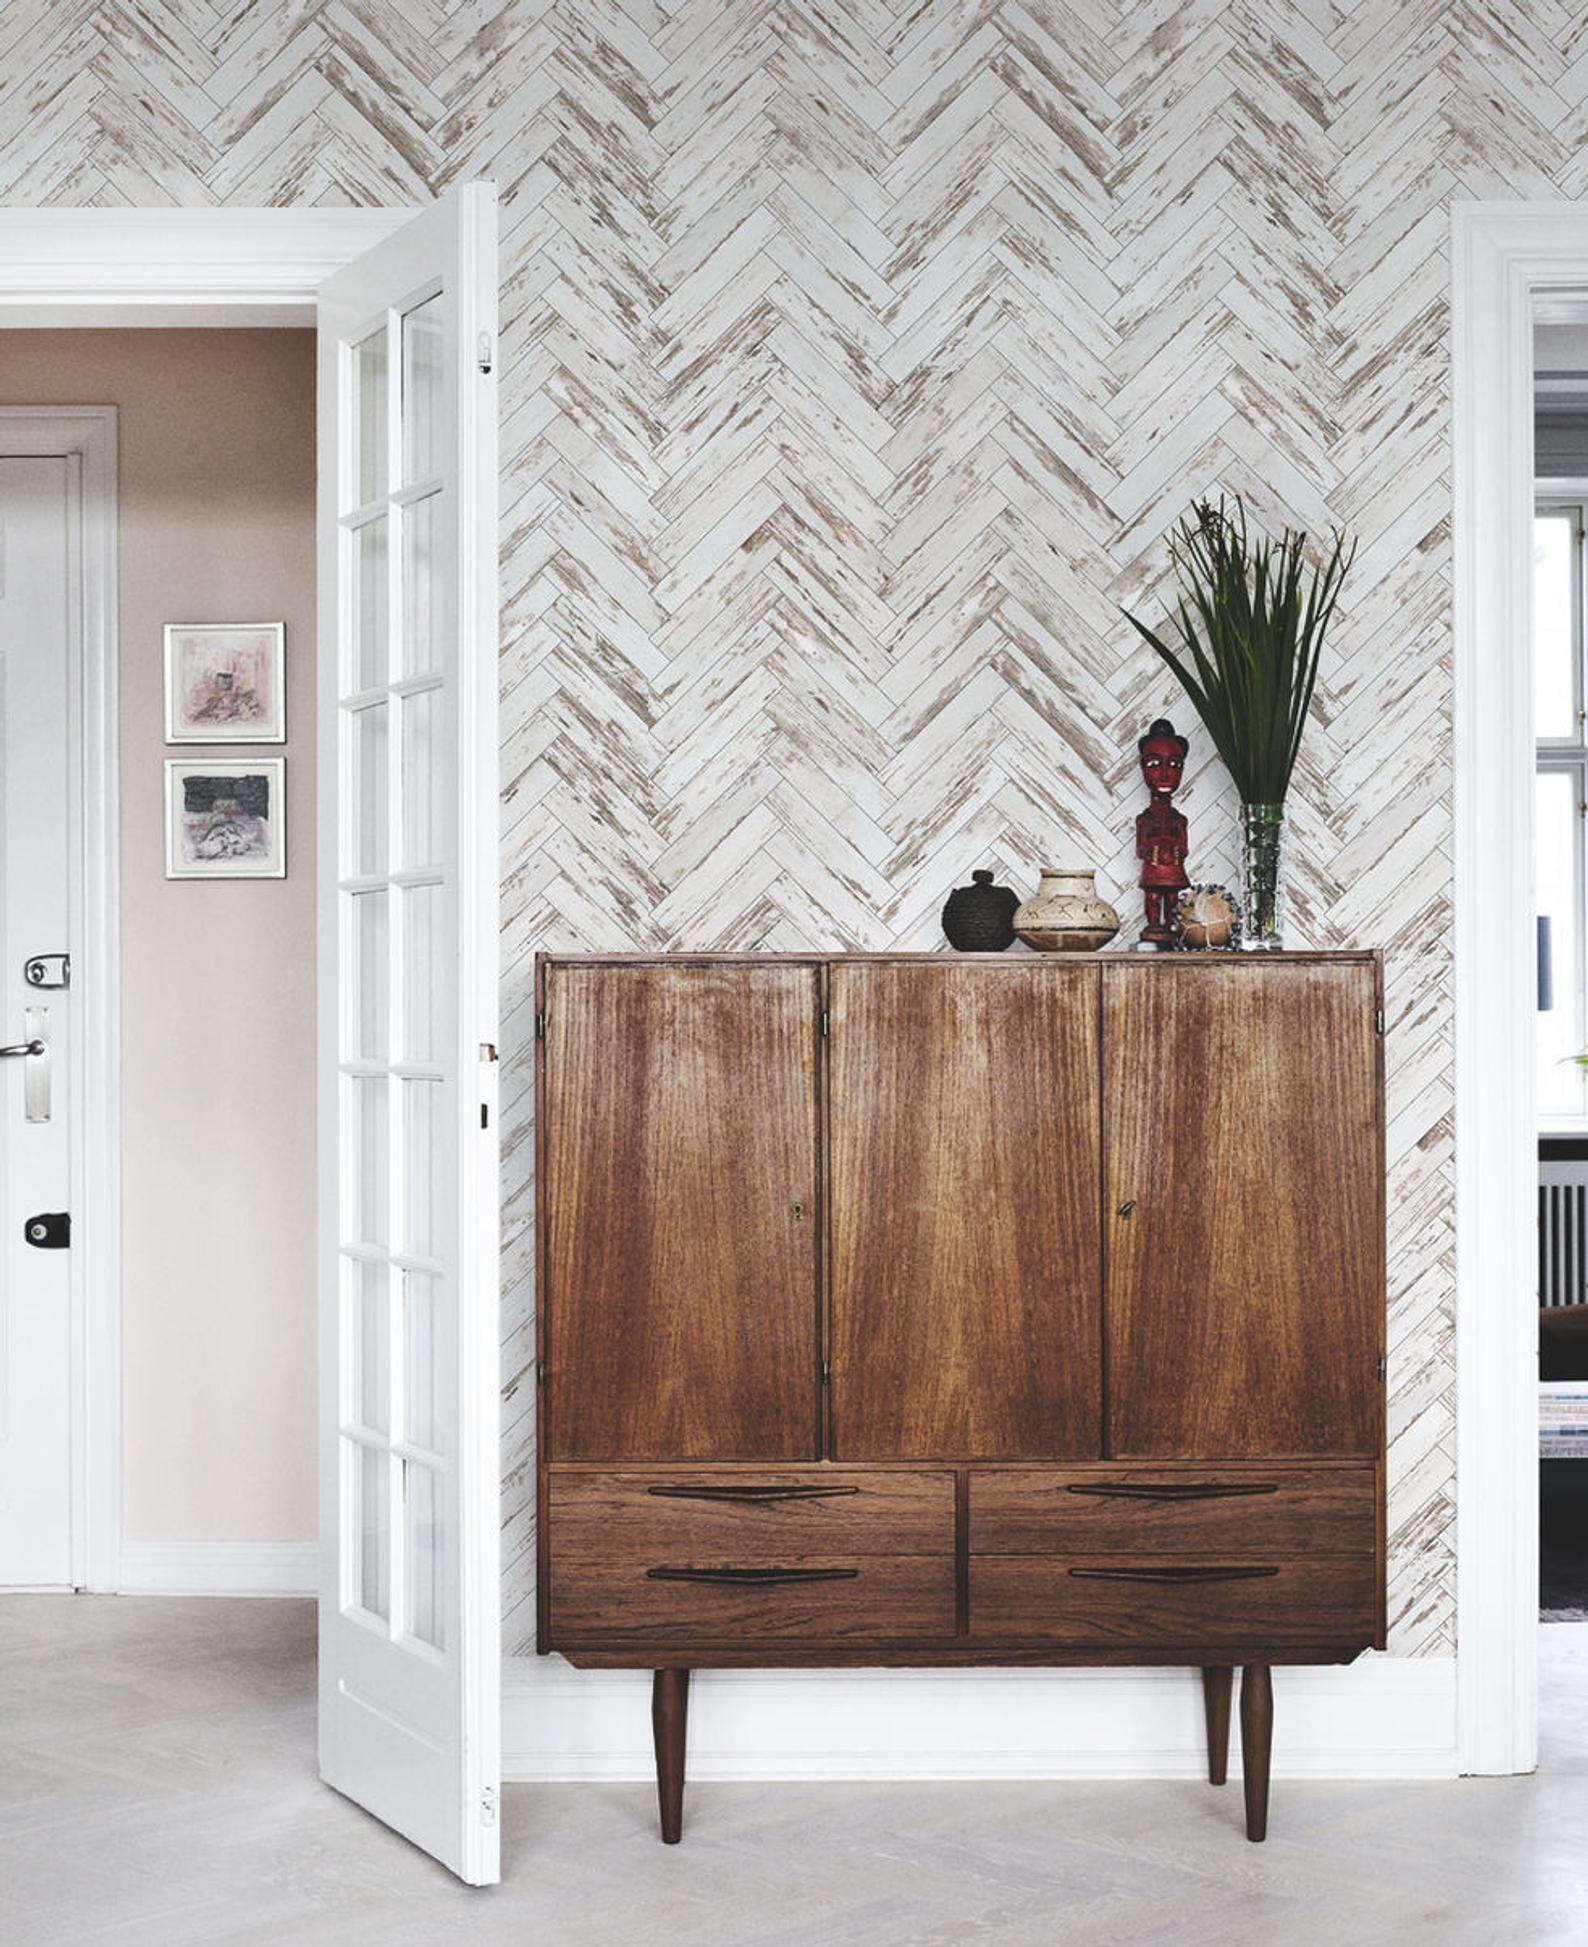 Wood Removable Wallpaper Vintage Chevron Herringbone Wall Etsy Herringbone Wall Removable Wallpaper Wooden Wallpaper